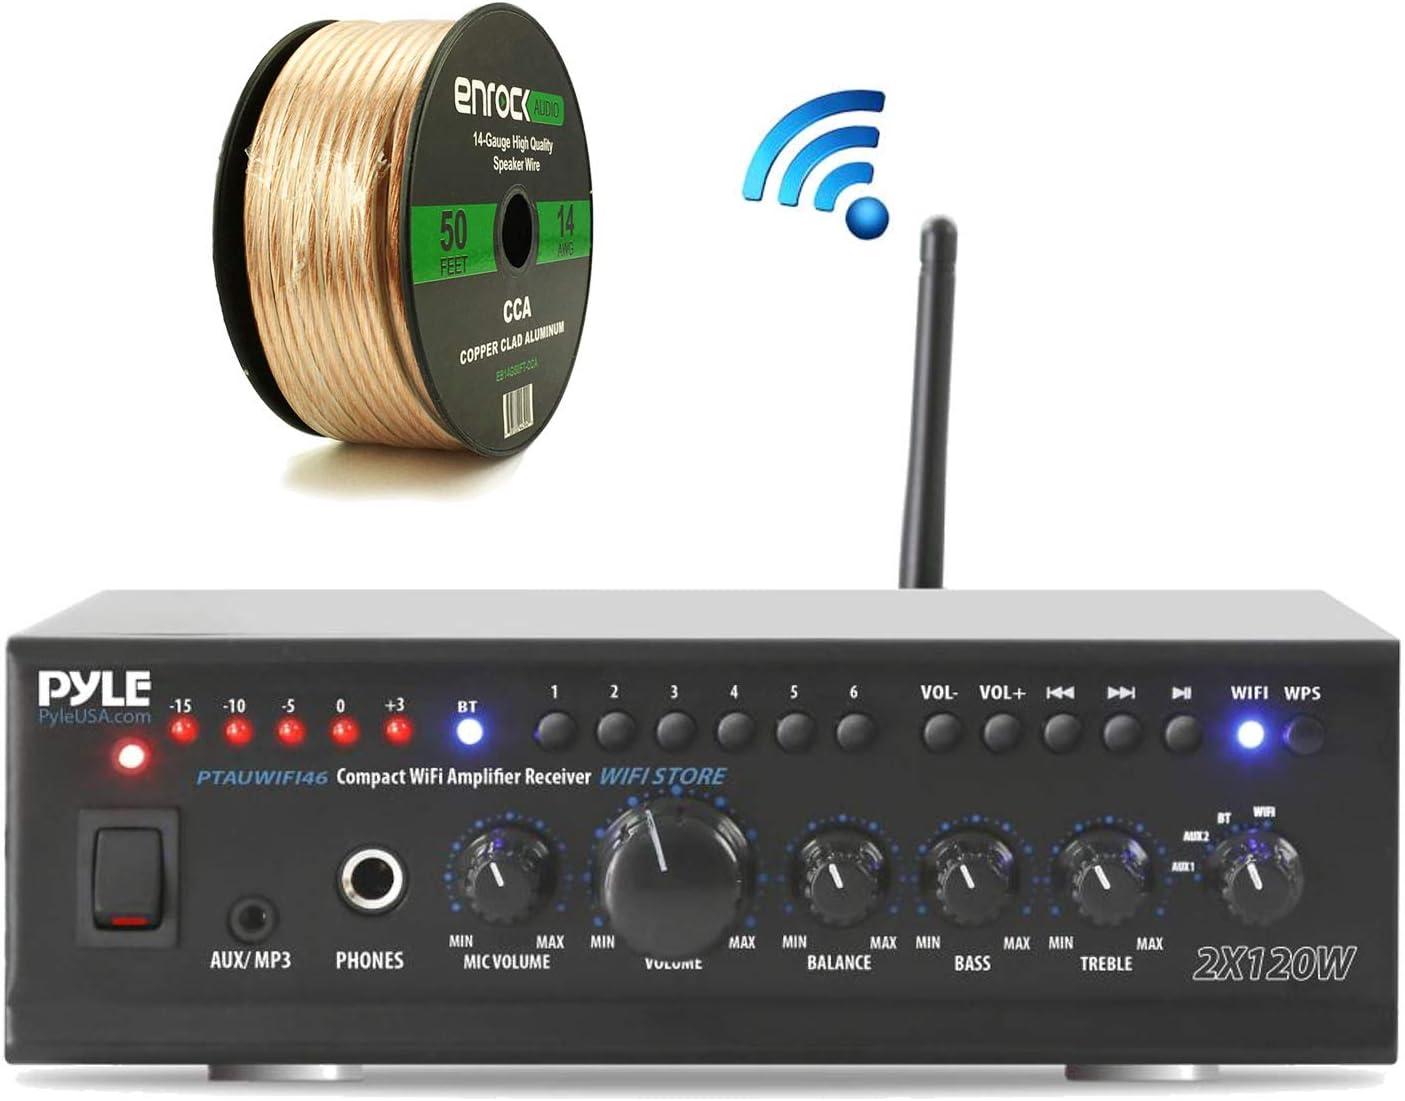 Pyle 240-Watt WiFi Bluetooth Stereo Amplifier Receiver Professional Home Theater Audio System, Enrock Audio 14-Gauge 50 Foot Speaker Wire (No Speaker)